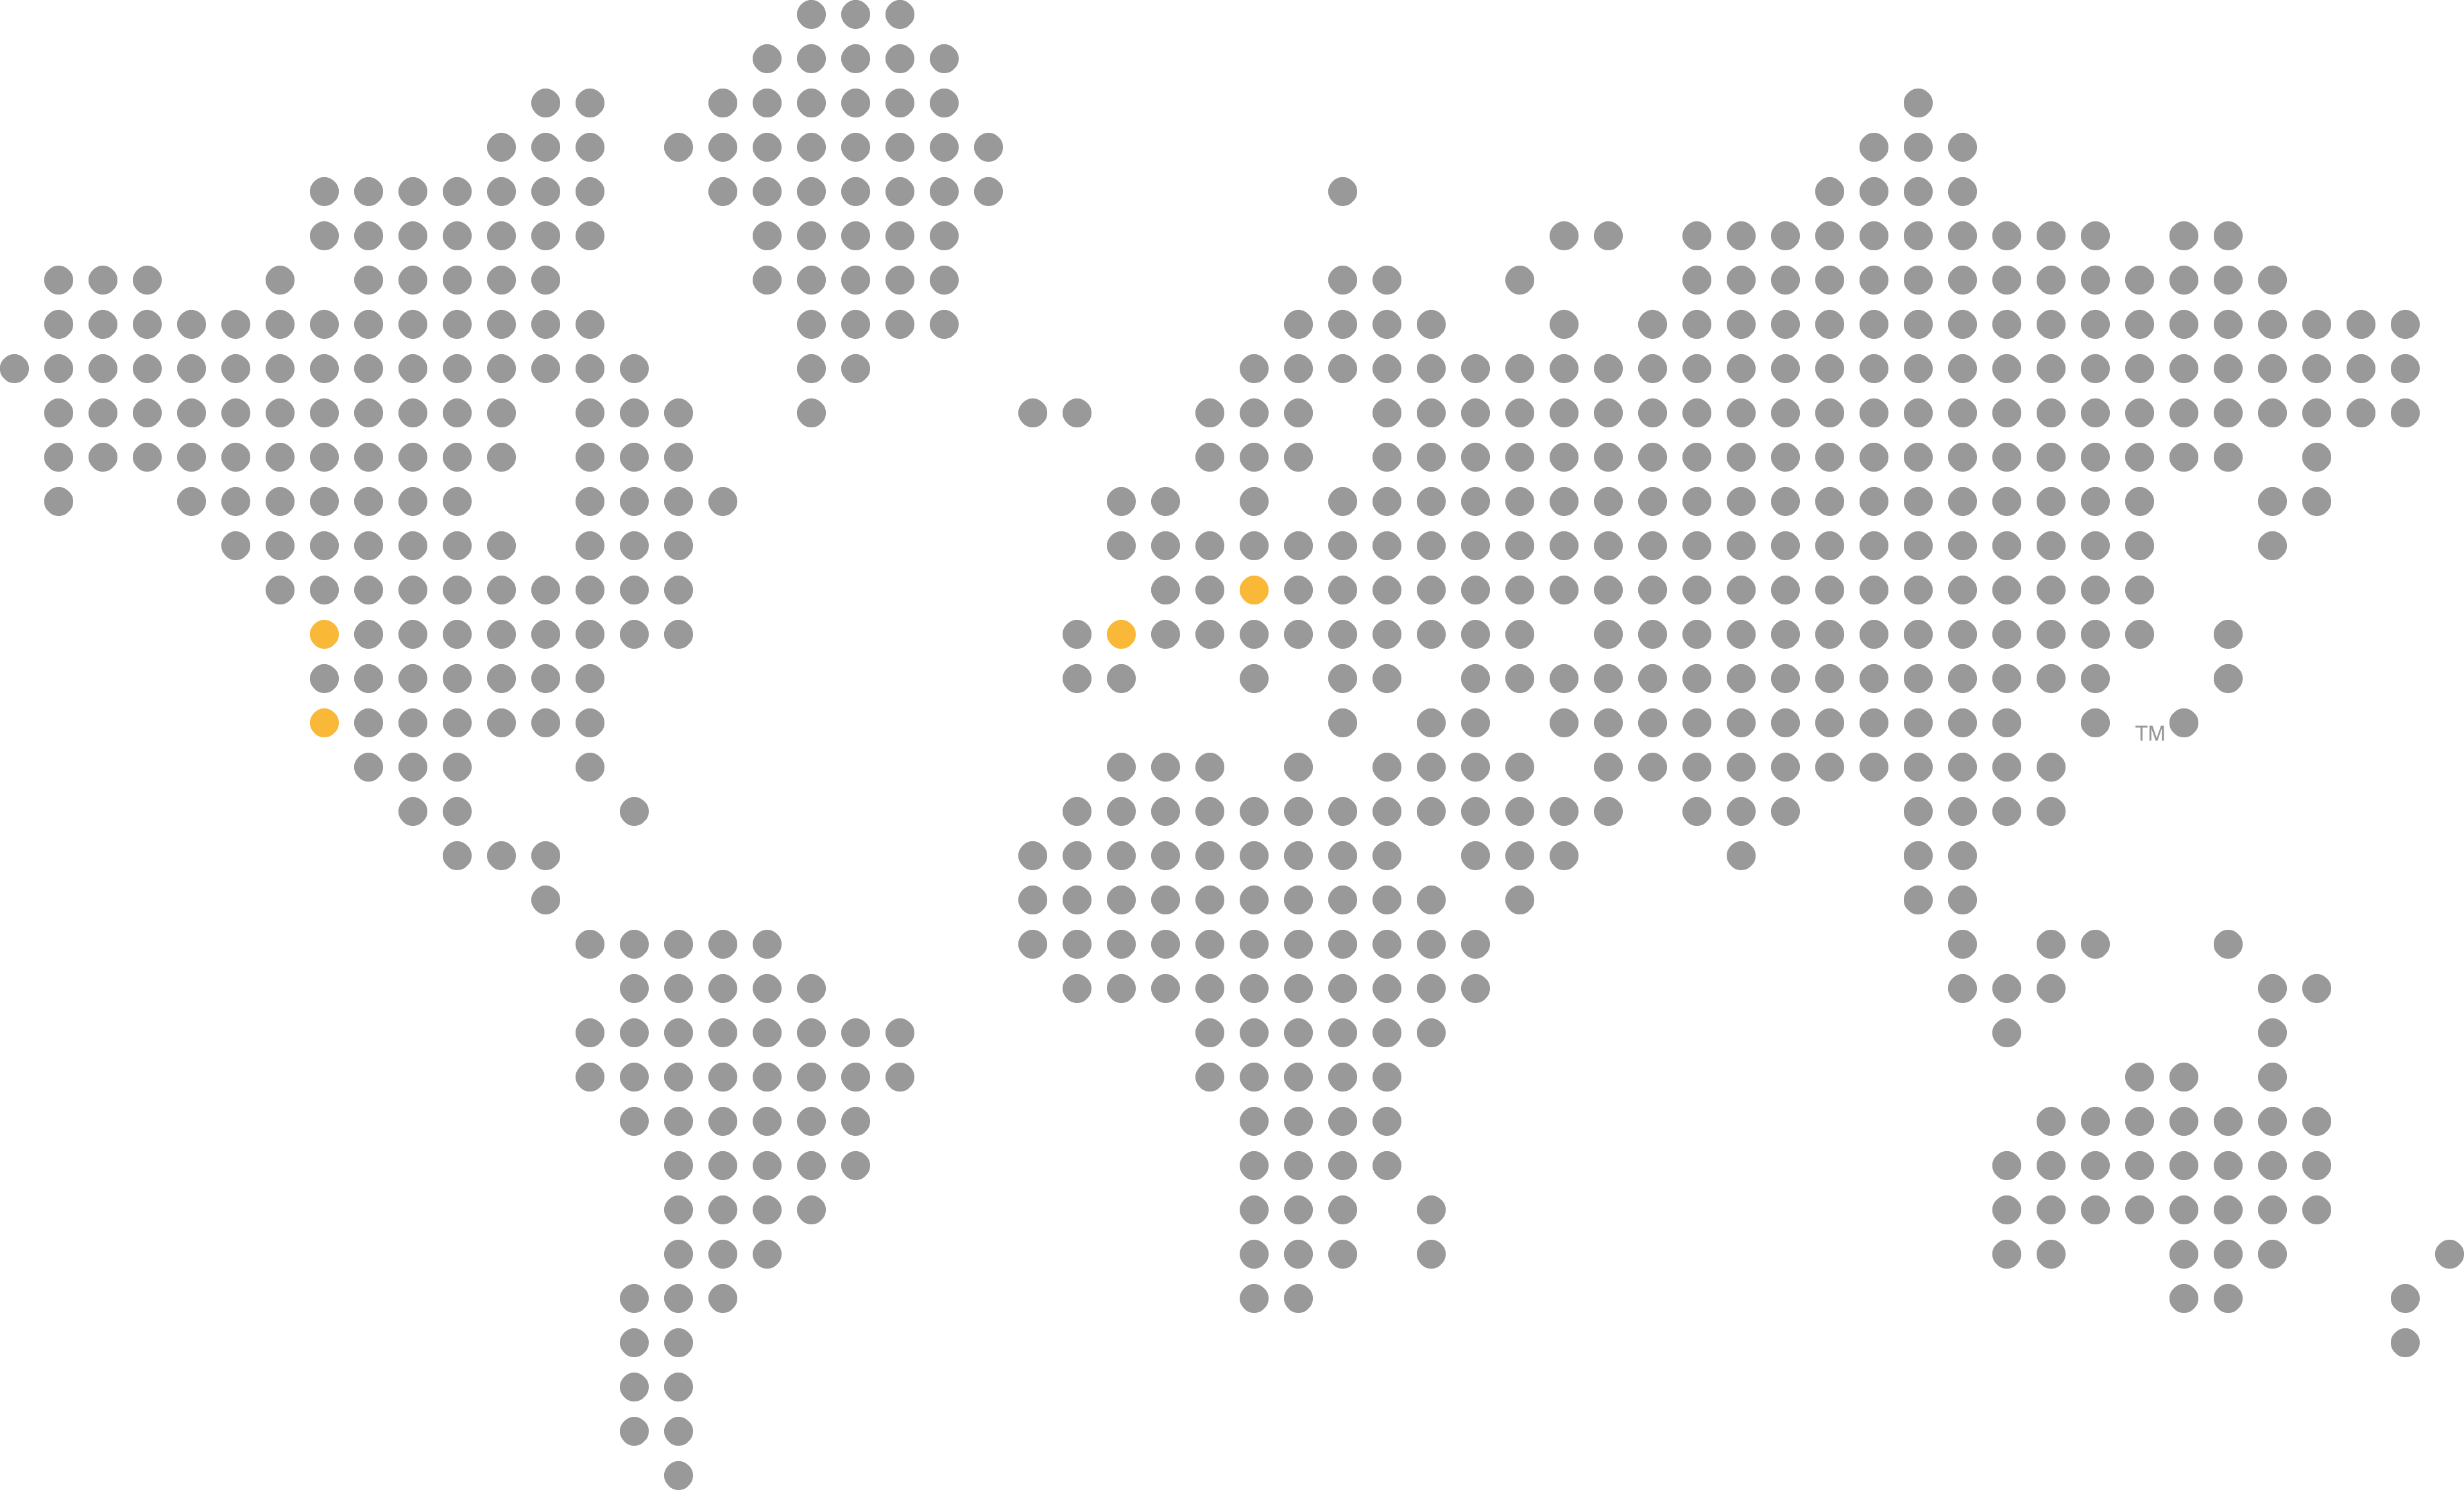 World Map PNG Transparent Images.